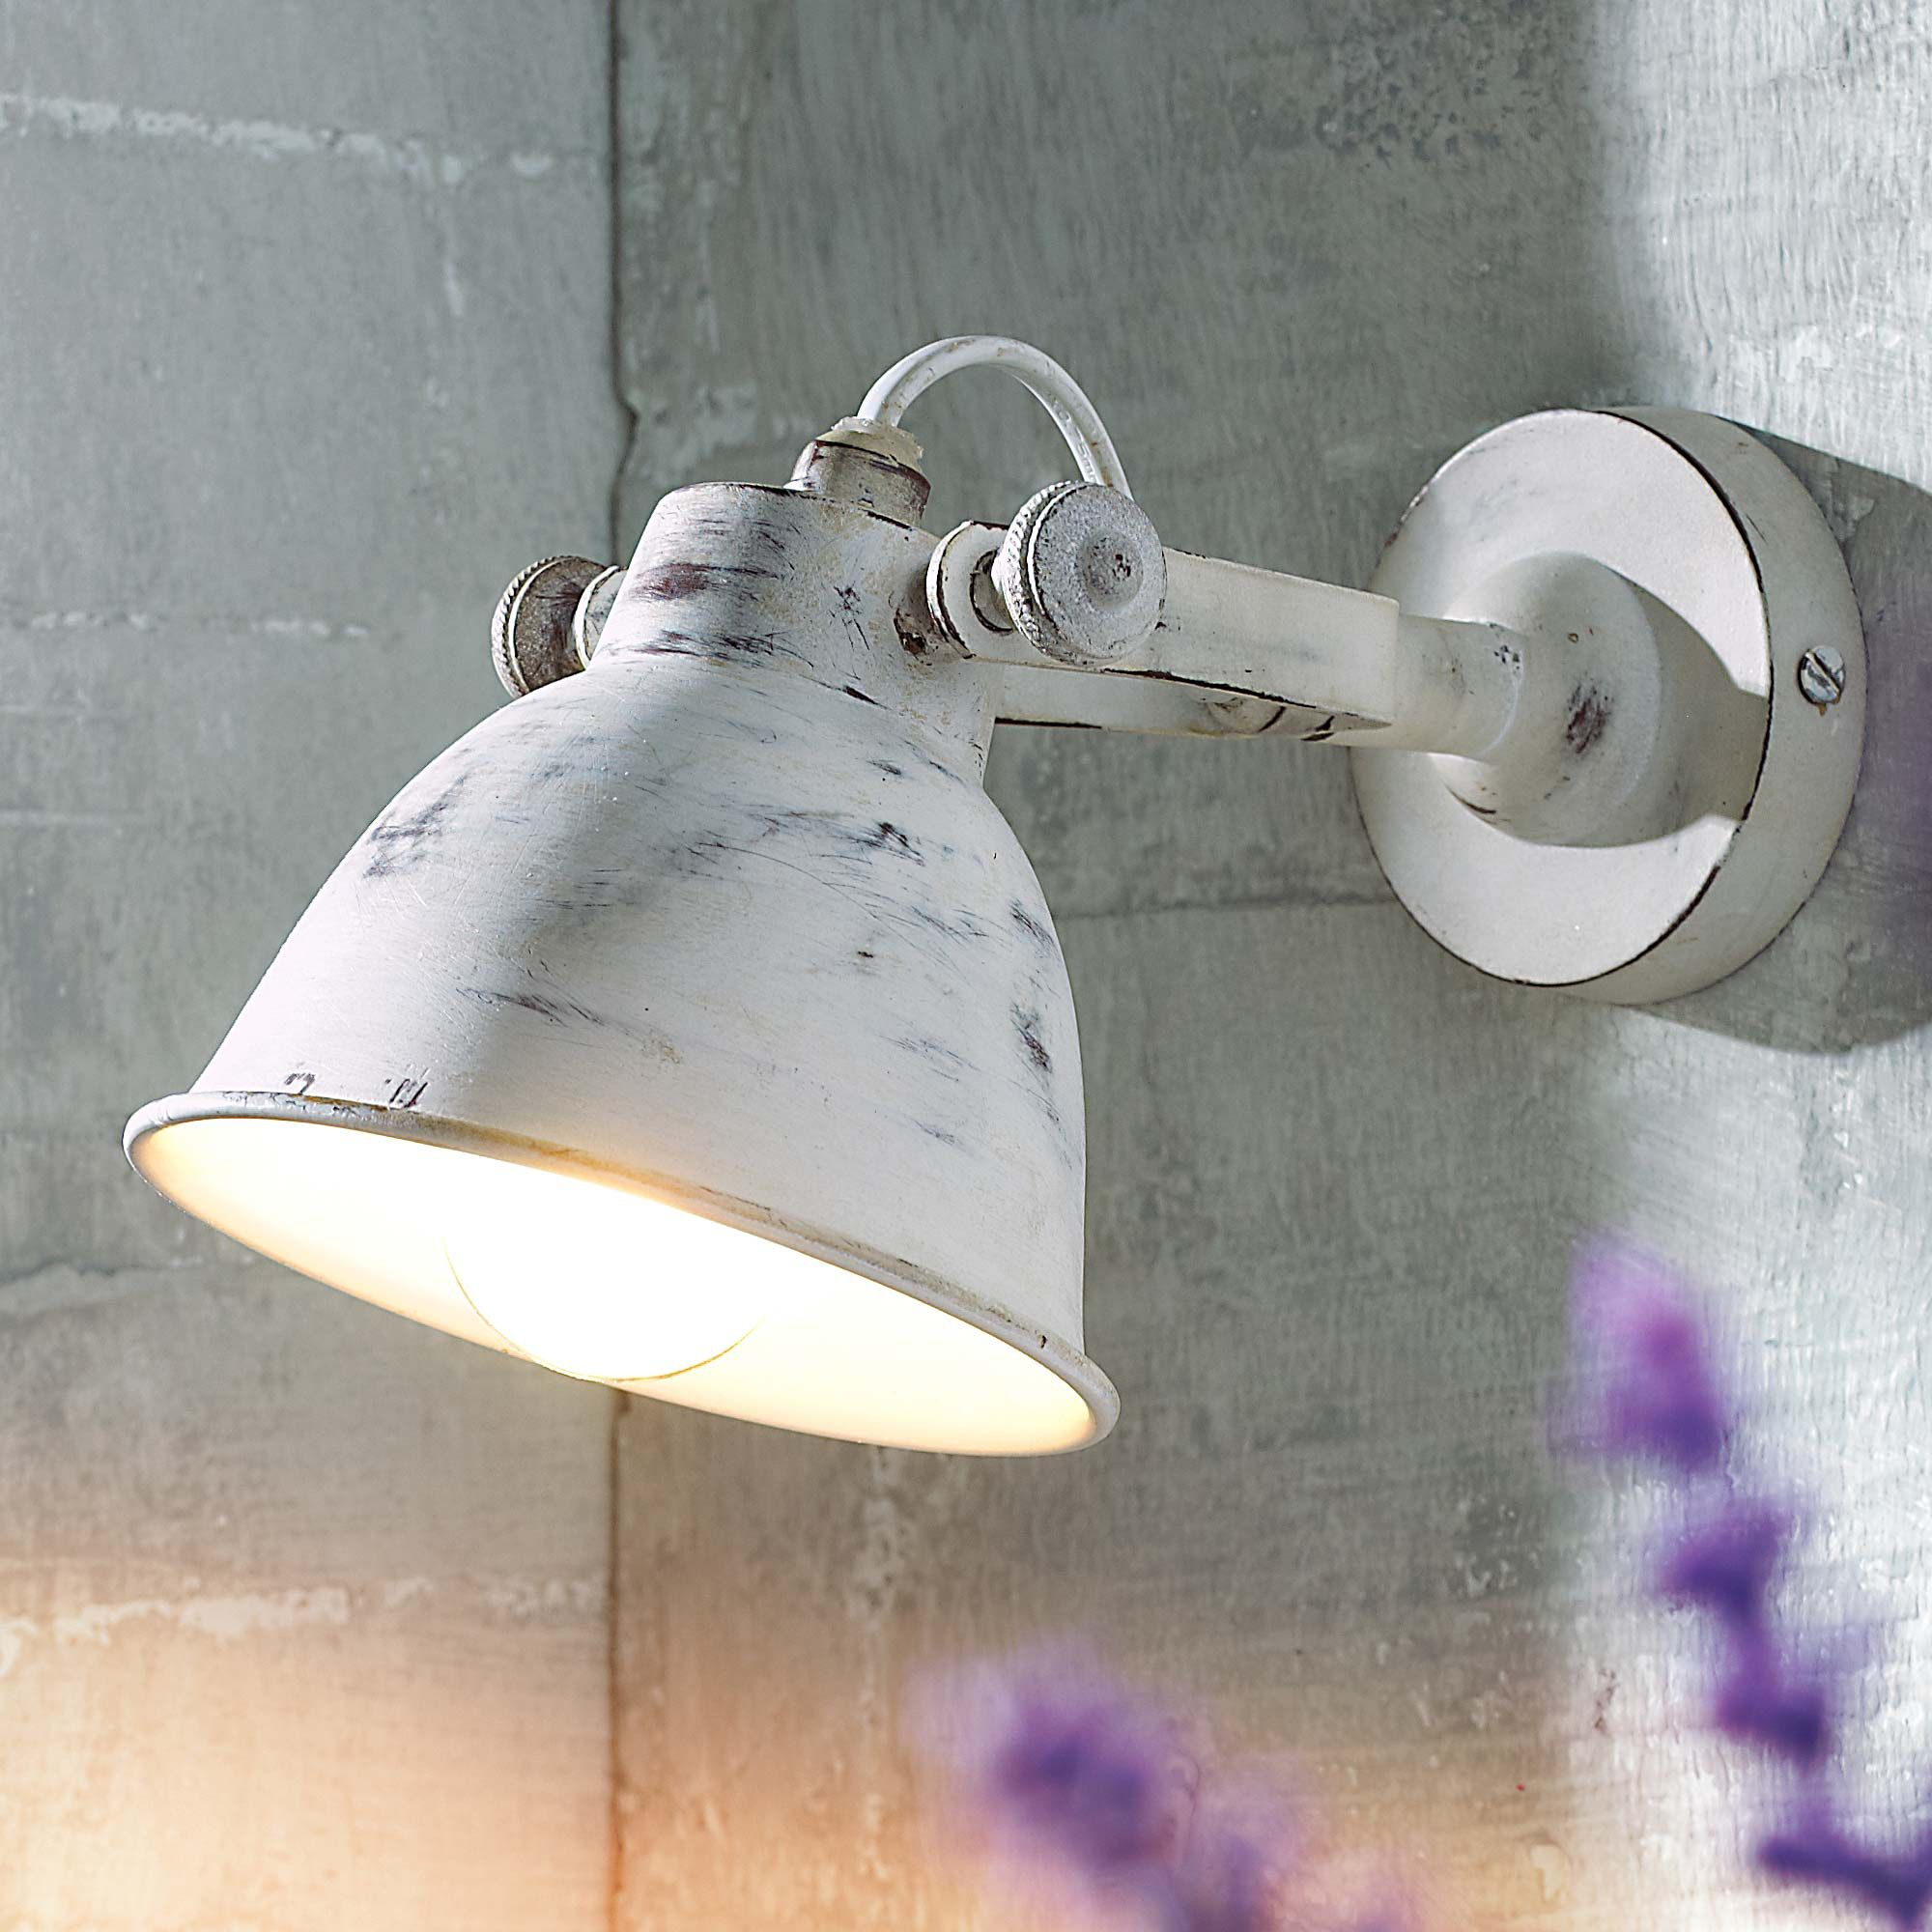 Wandleuchte Used Look Schirm Individuell Einstellbar Wandleuchten Leuchten Wohnen Wandleuchte Wandleuchte Vintage Wandlampe